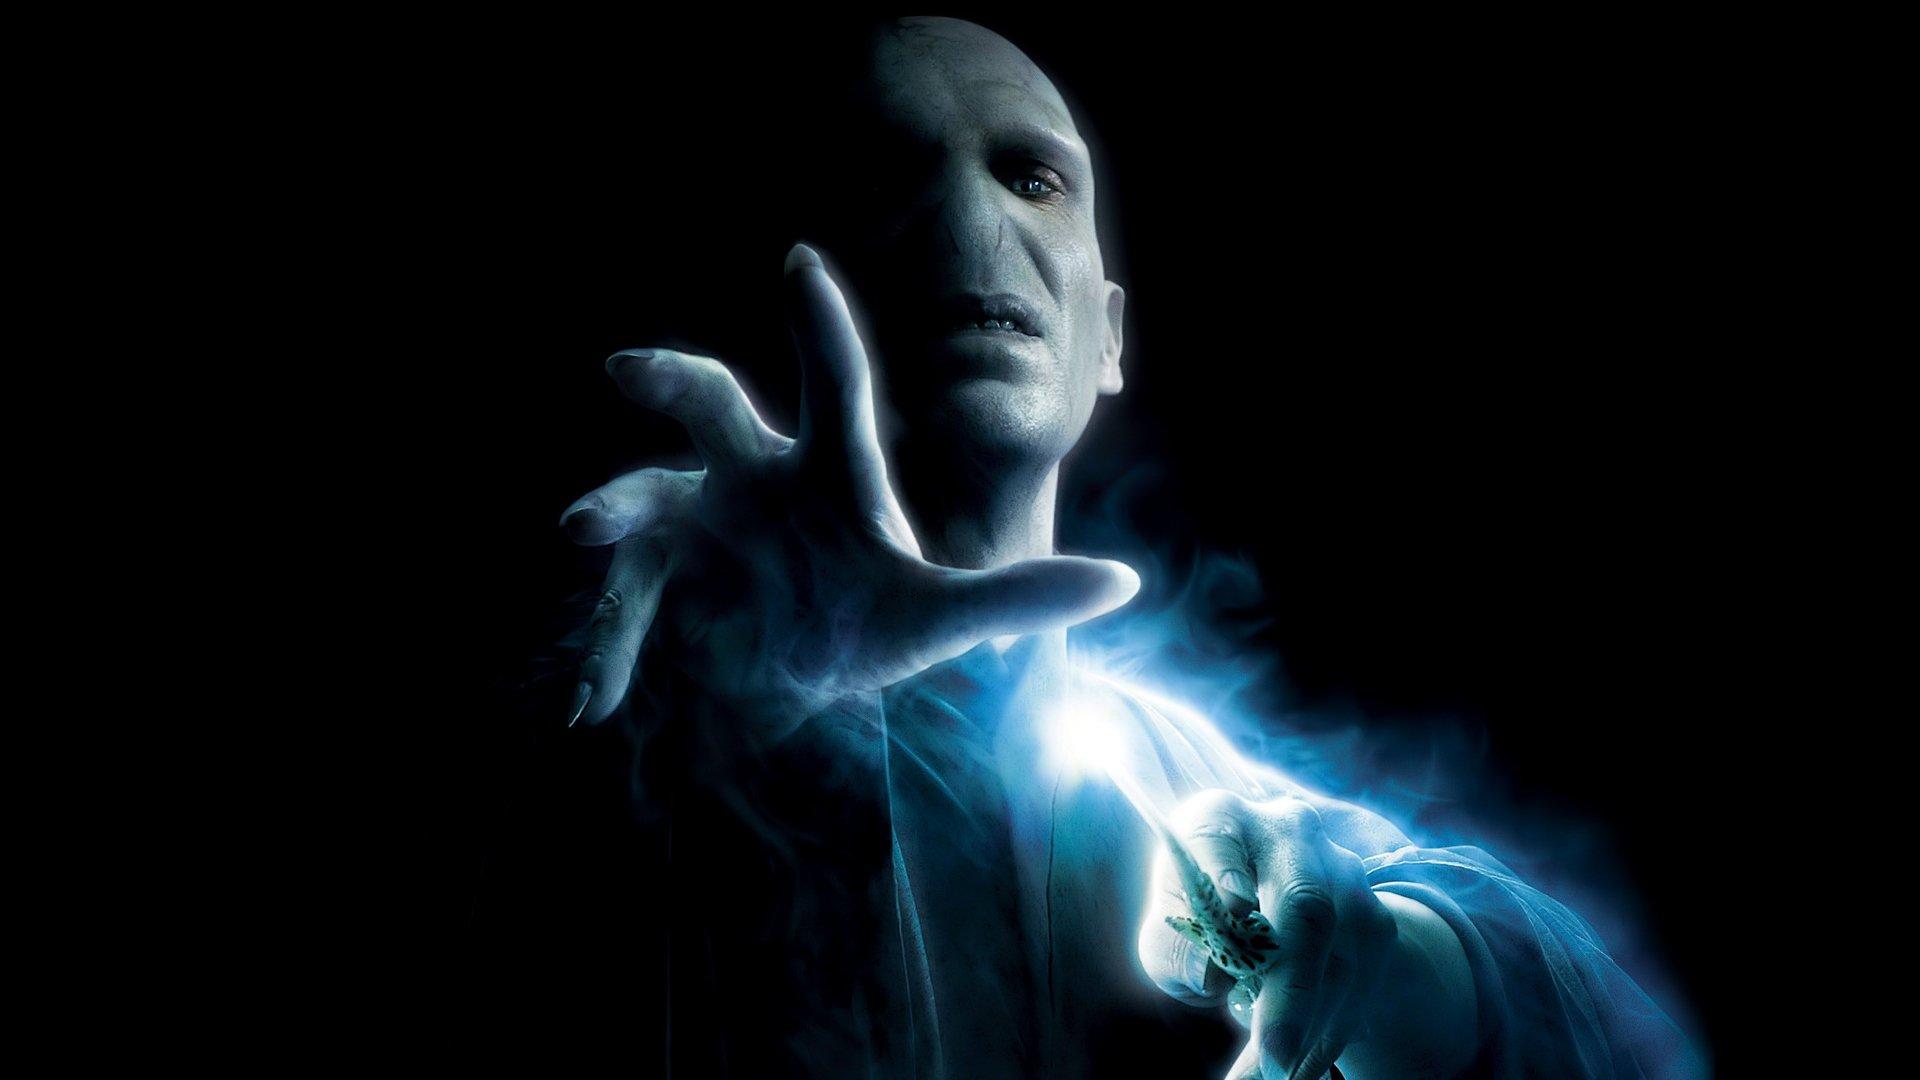 Download Wallpaper Harry Potter Black - thumb-1920-273765  2018_959661.jpg